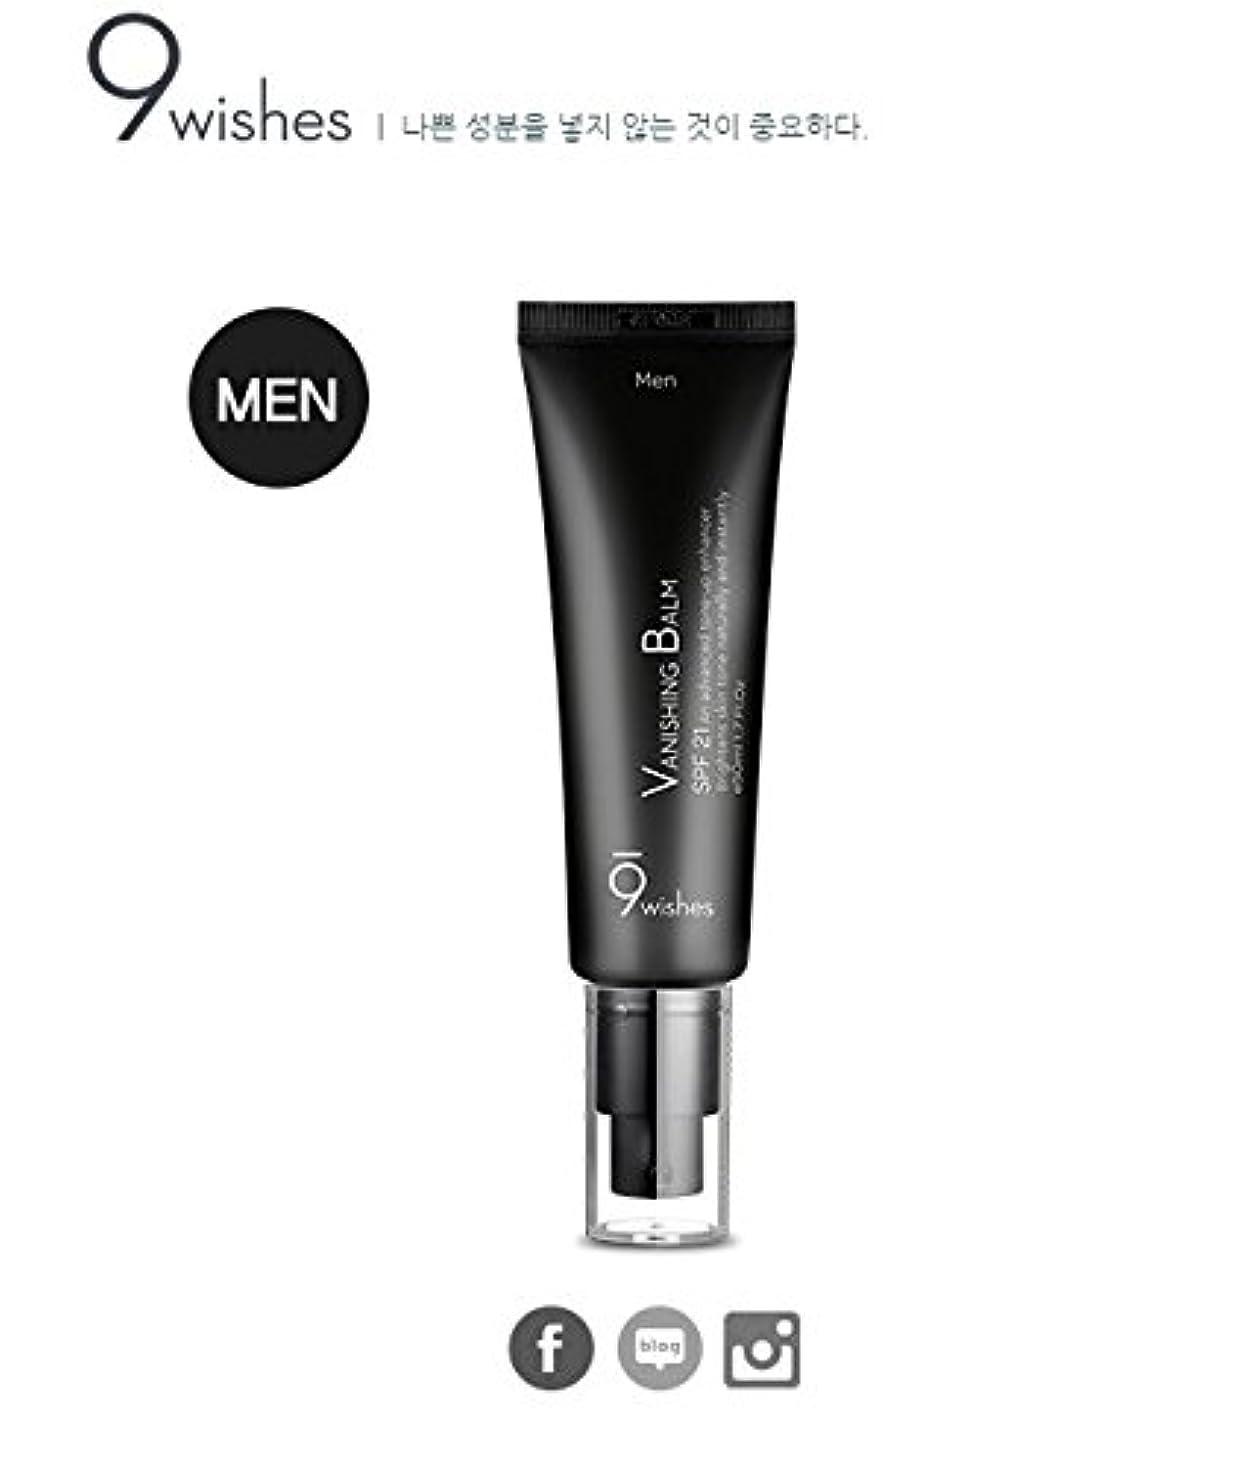 9Wishes VB トーンアップ フォー メン(男性用) / VB TONE-UP FOR MEN [並行輸入品]